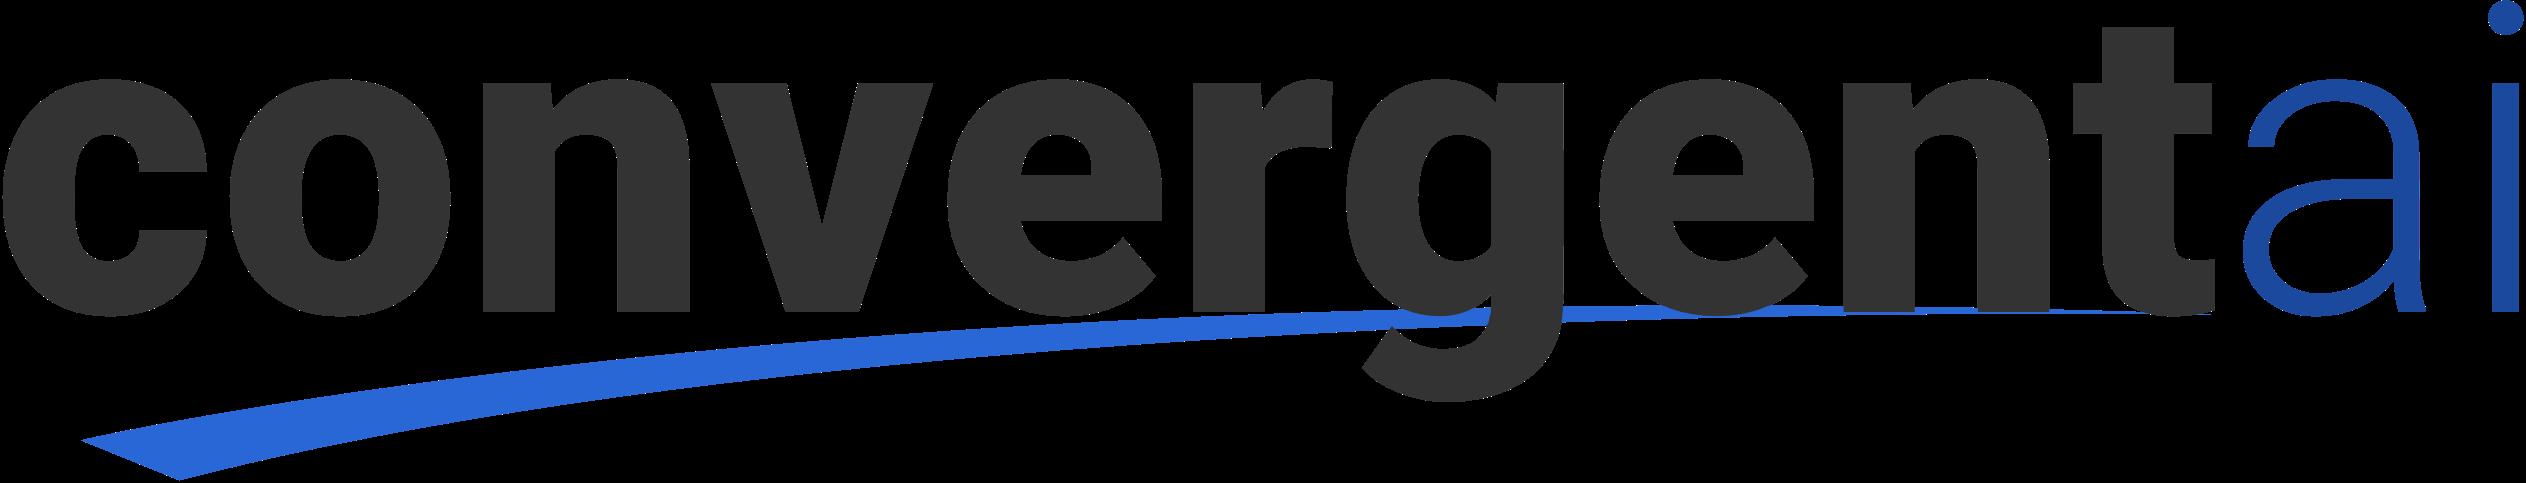 Convergent AI logo